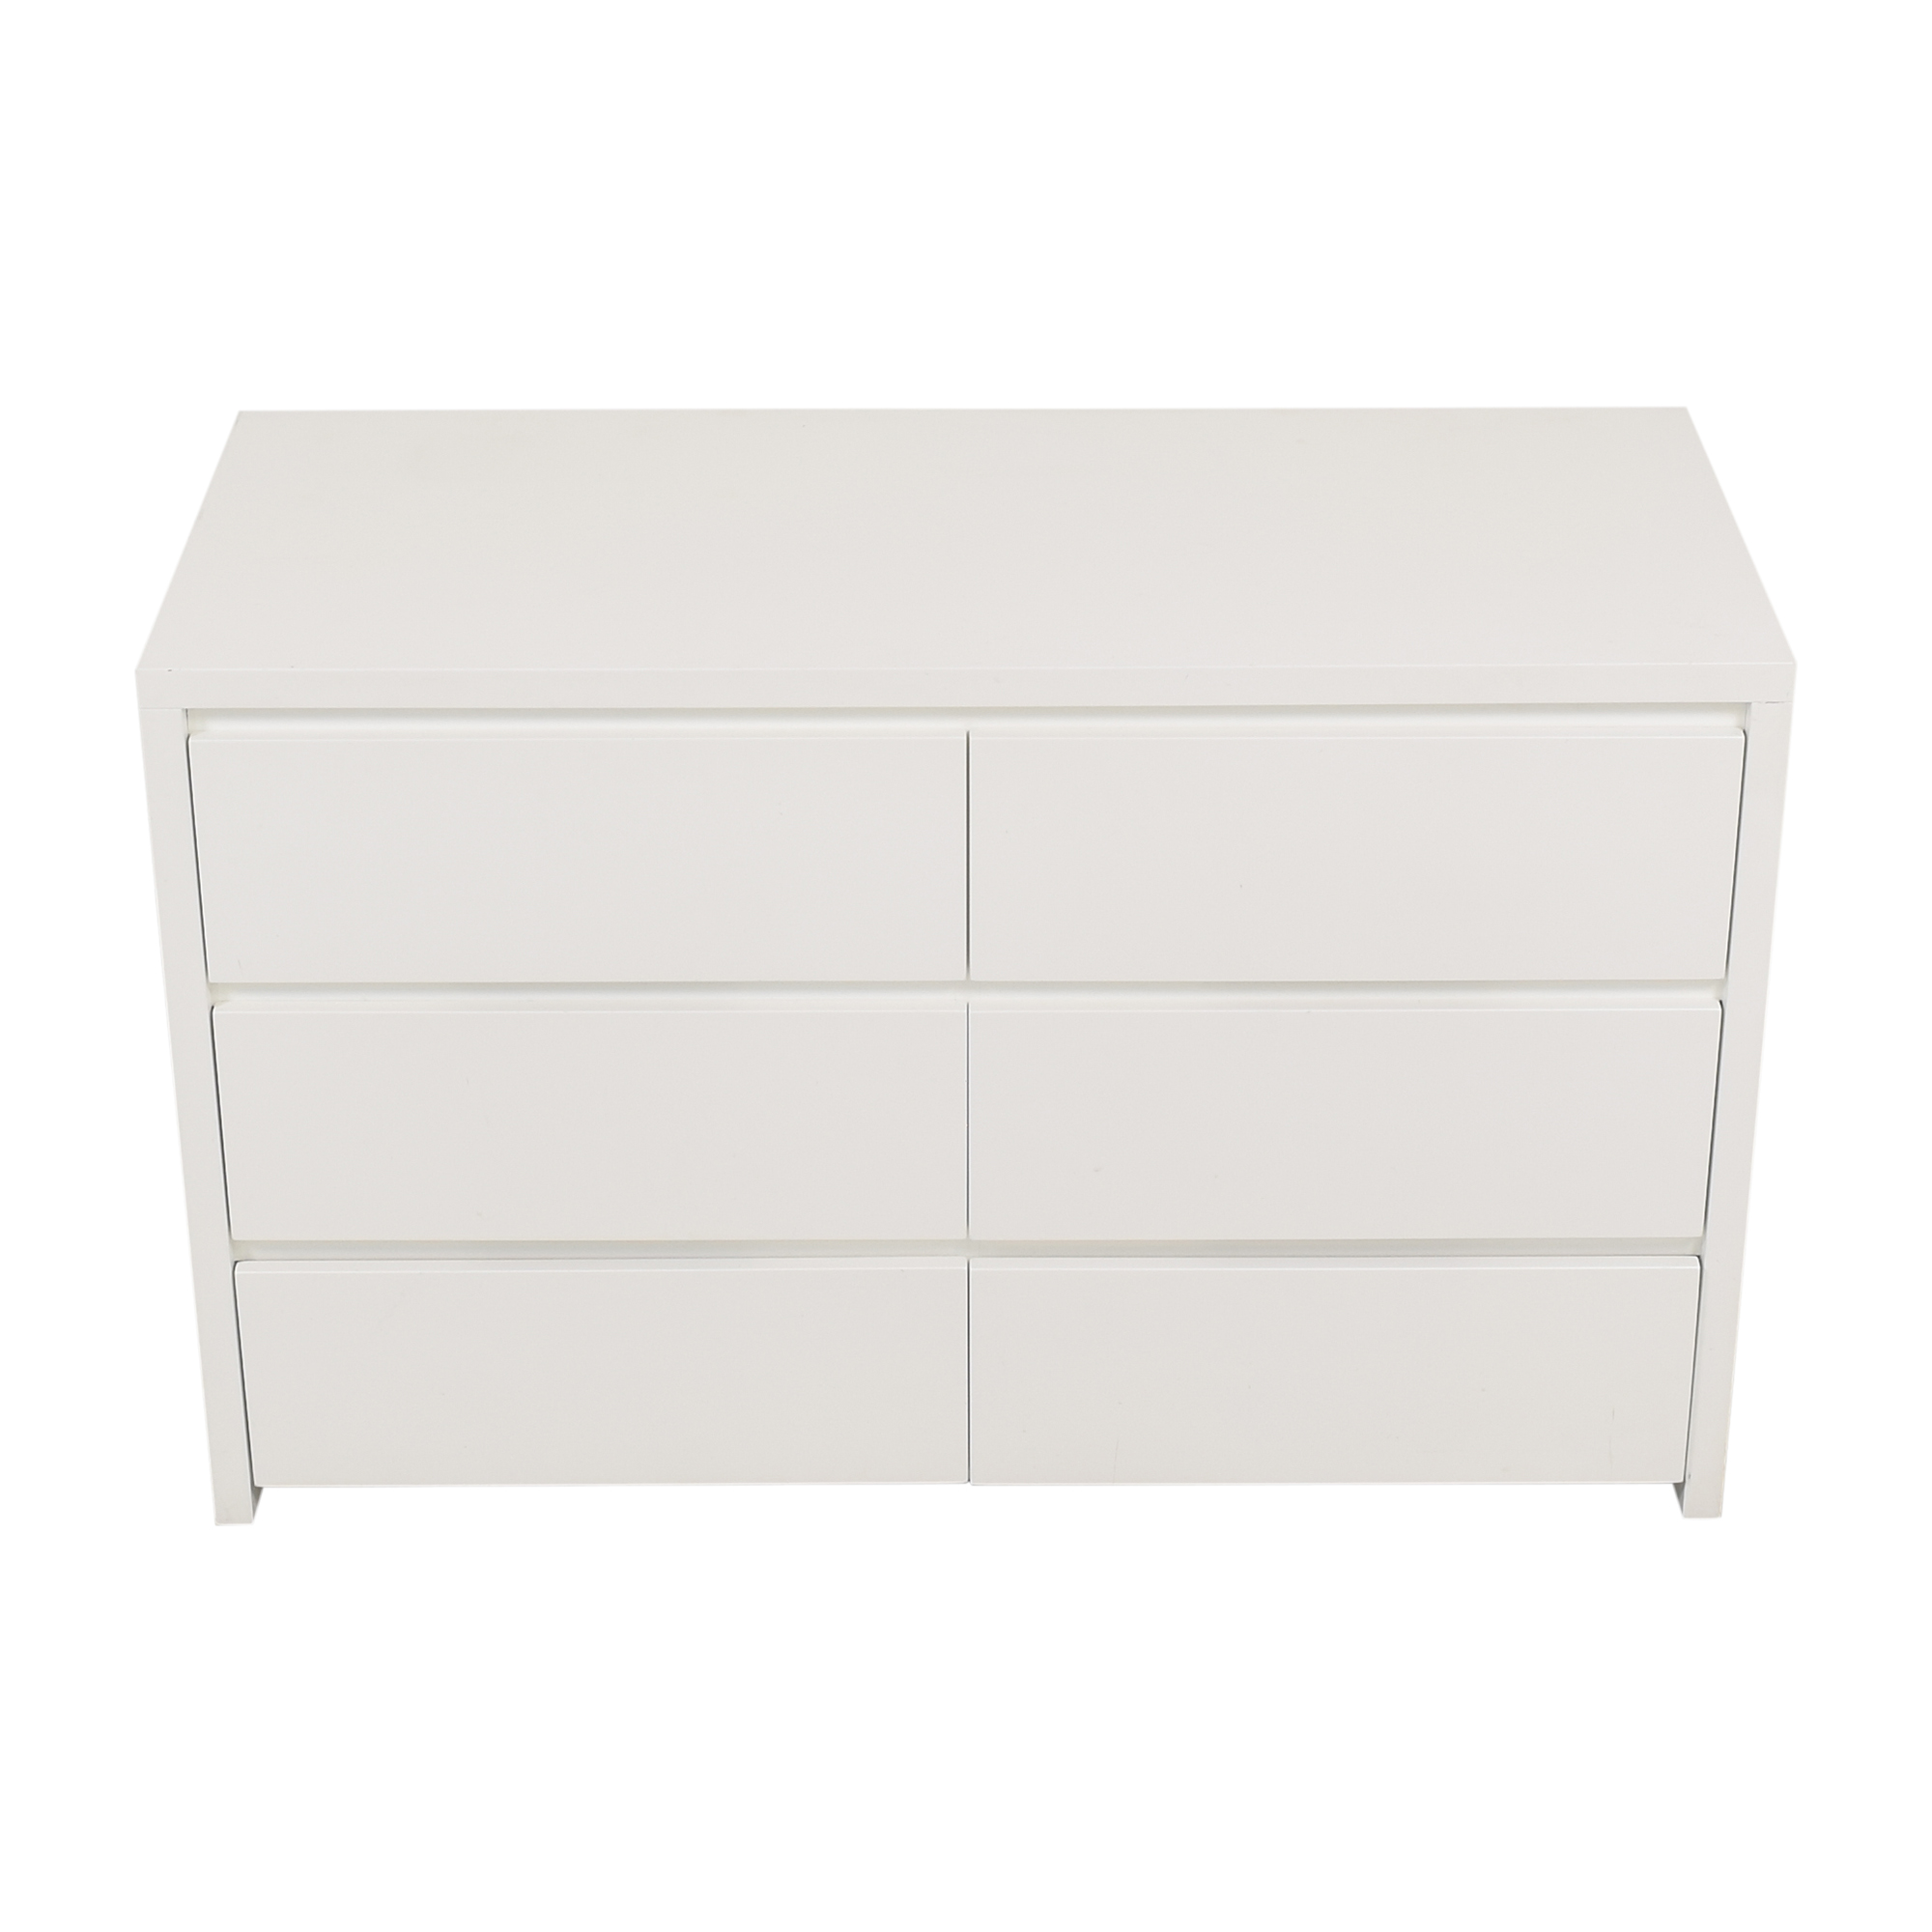 Urbangreen Six Drawer Urban Basics Dresser / Dressers